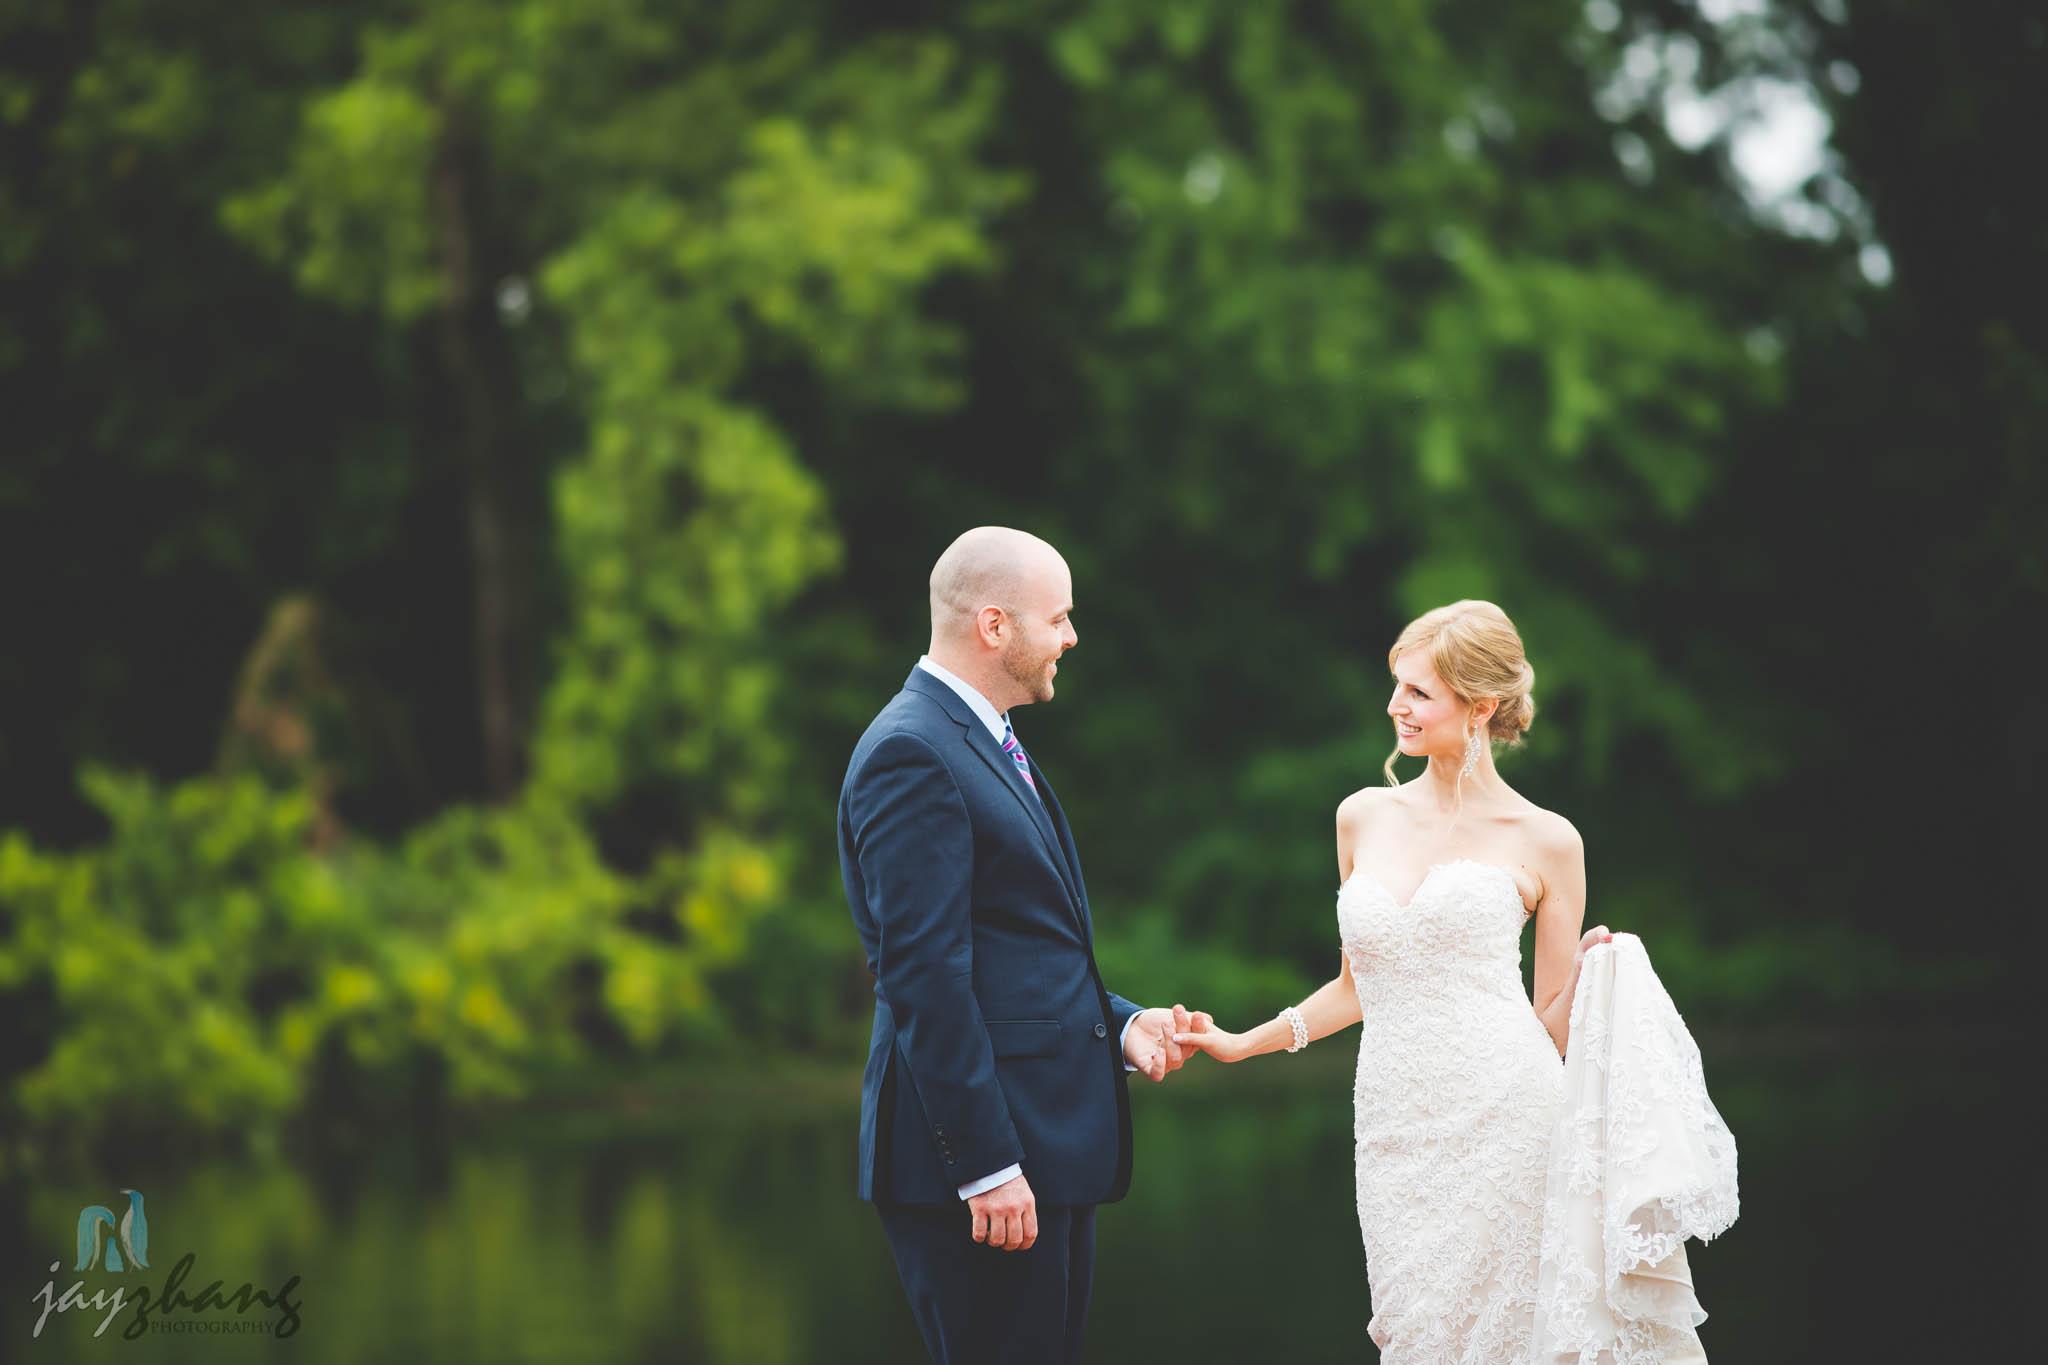 Albany_Wedding_Photographer-22.jpg